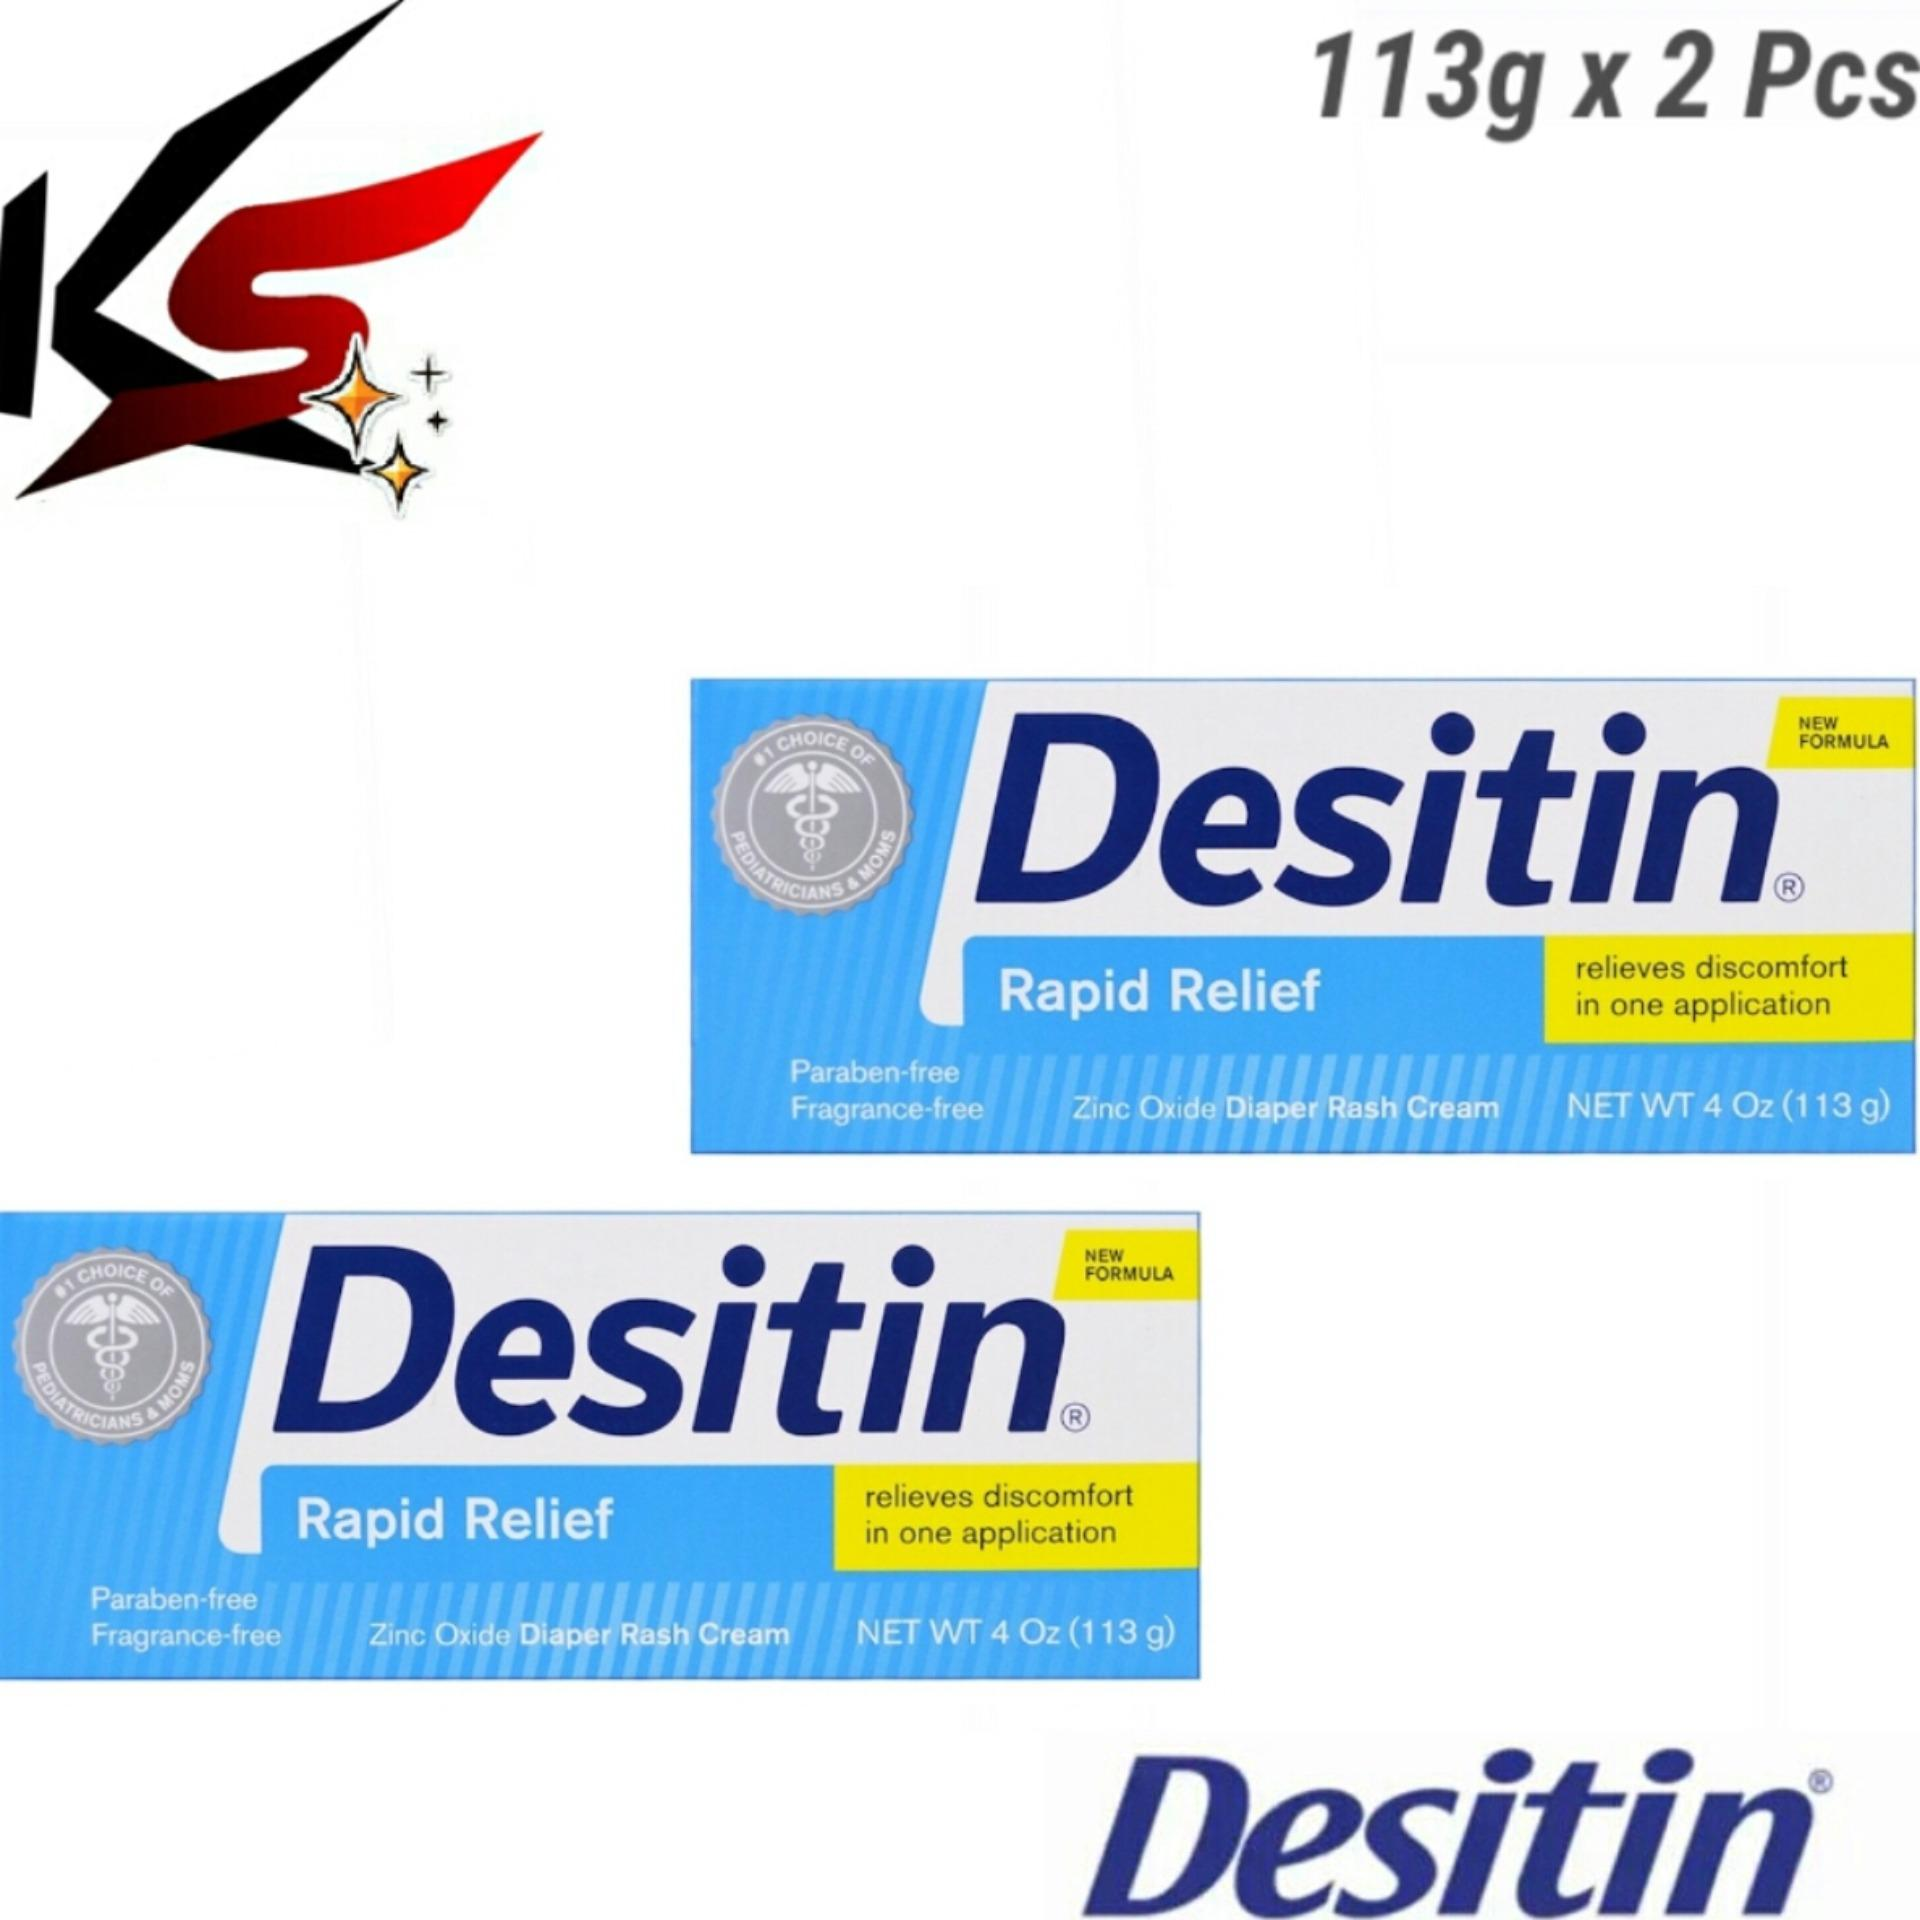 Check For Price Of Desitin Baby Diaper Rash Relief Rapid Sebamed Cream 100ml 113g X 2 Pcs